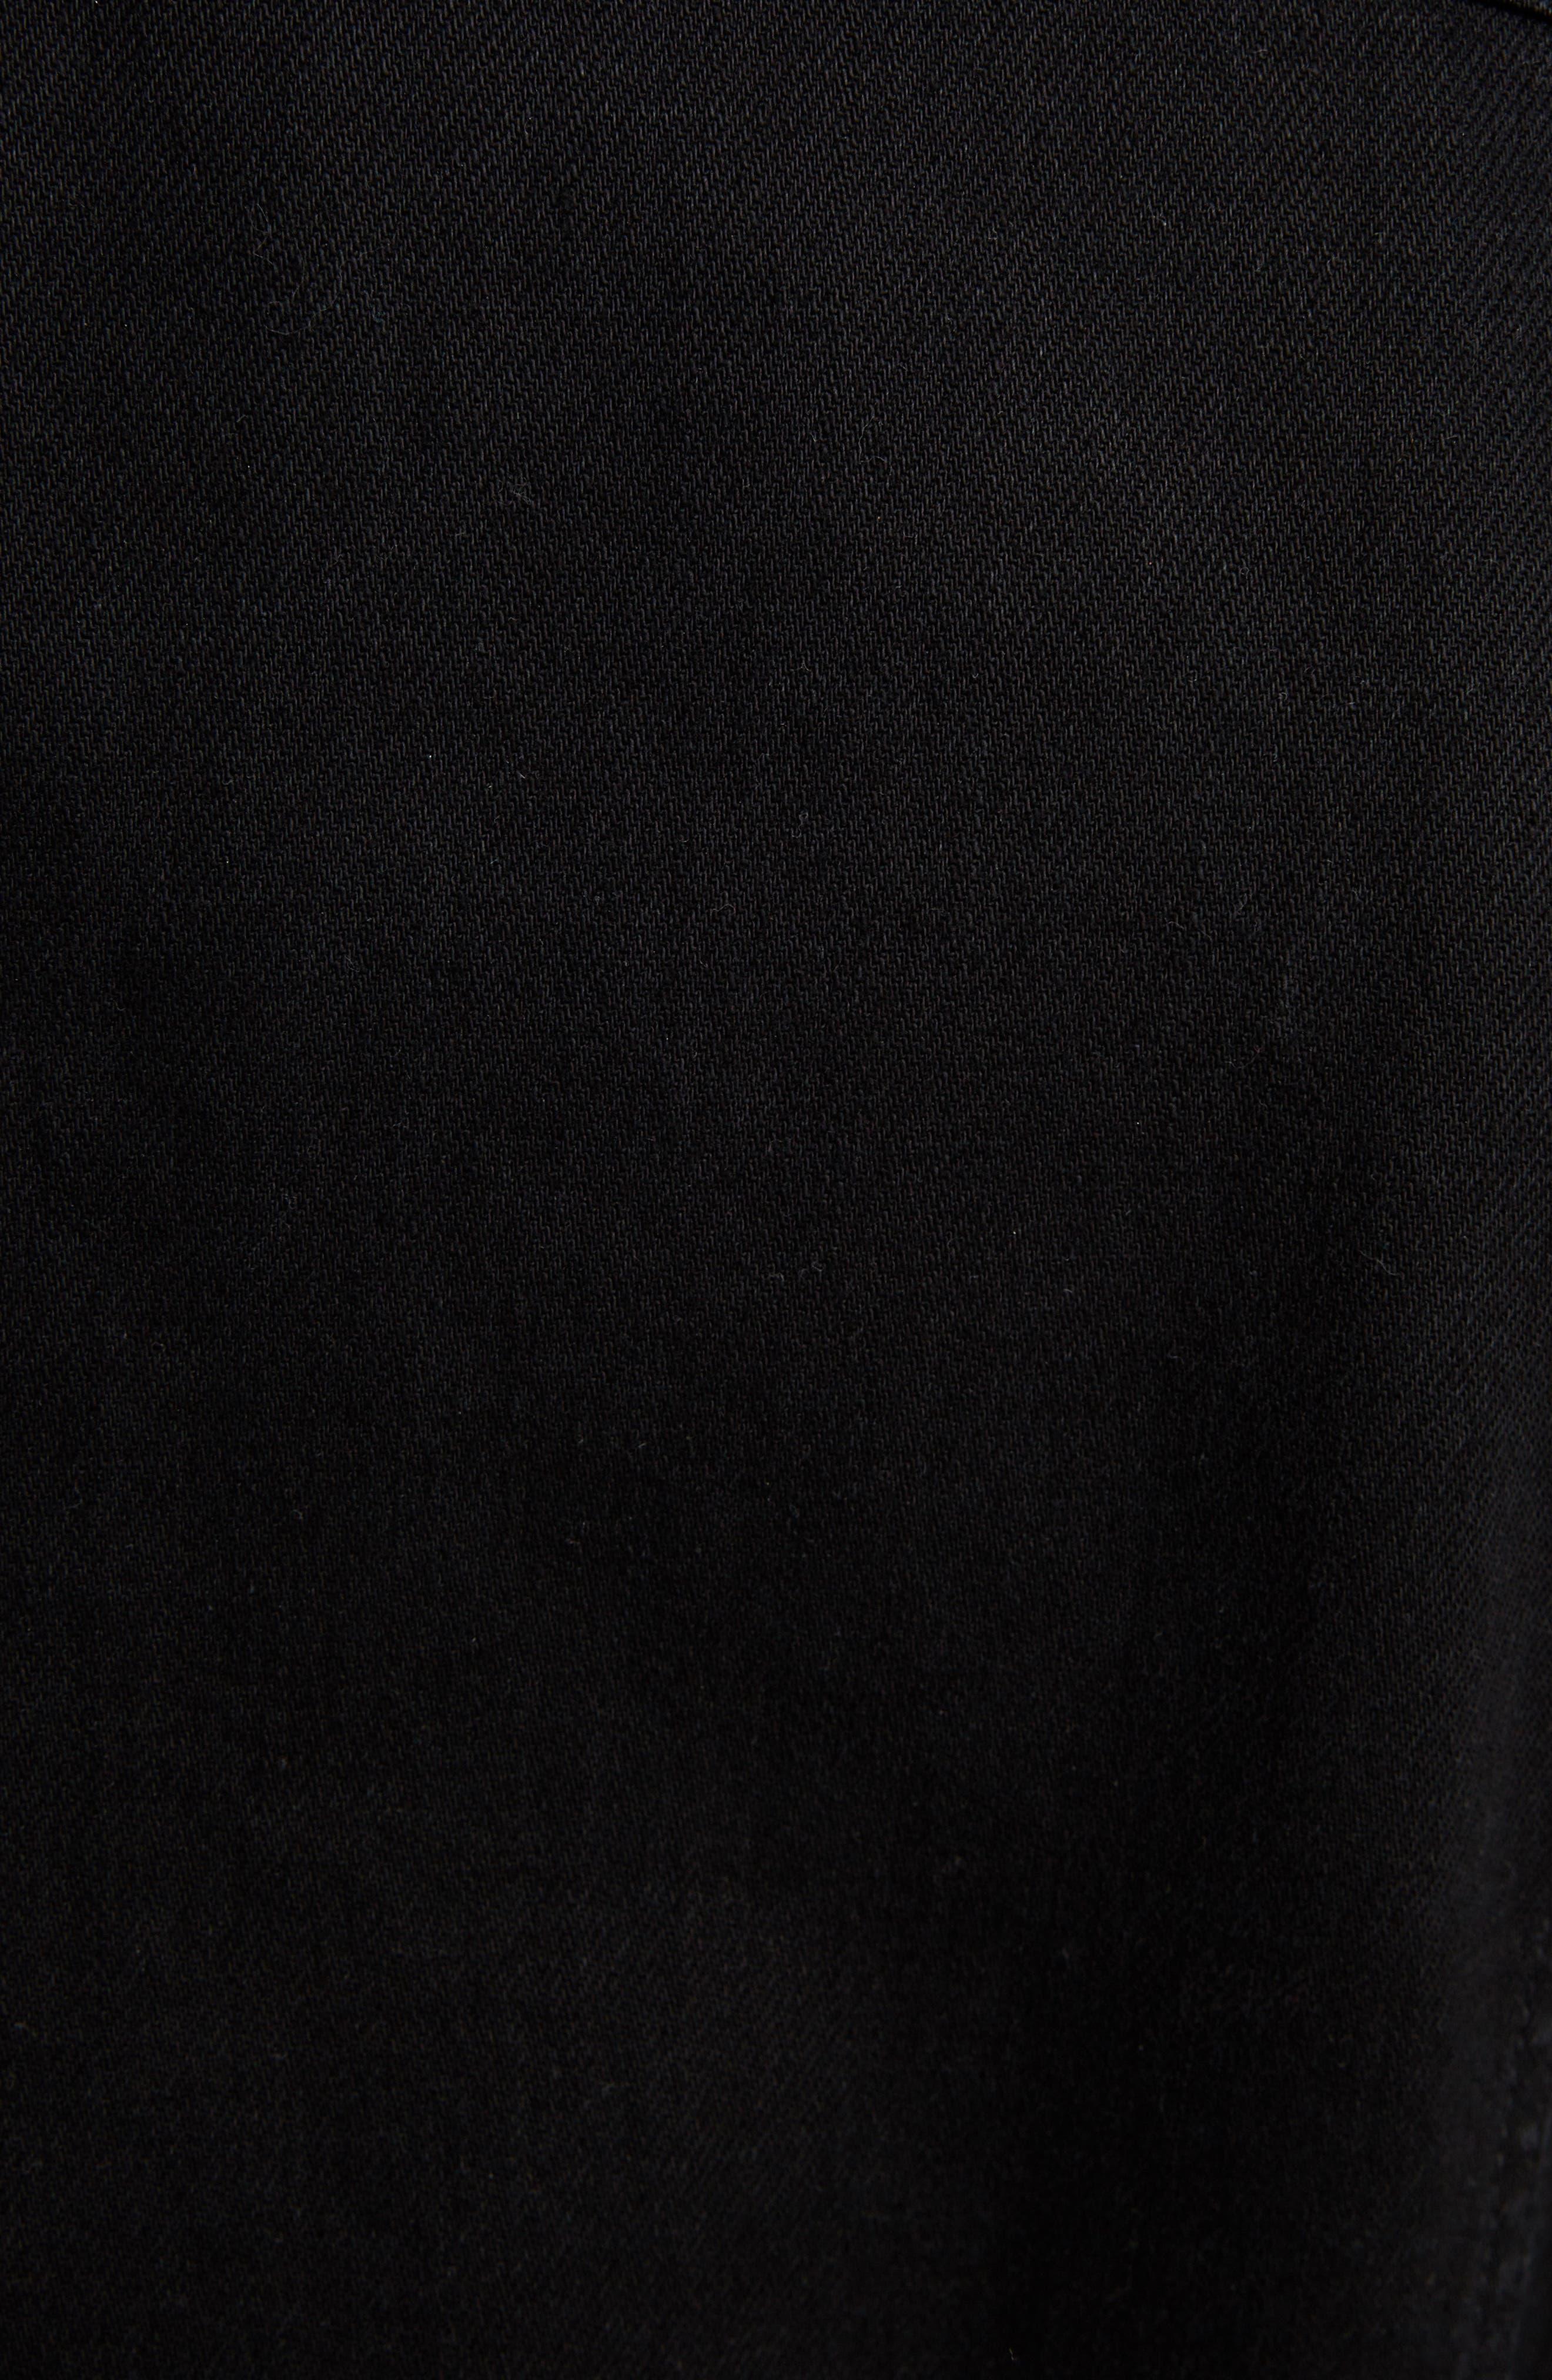 GIVENCHY,                             Logo Denim Jacket,                             Alternate thumbnail 5, color,                             BLACK